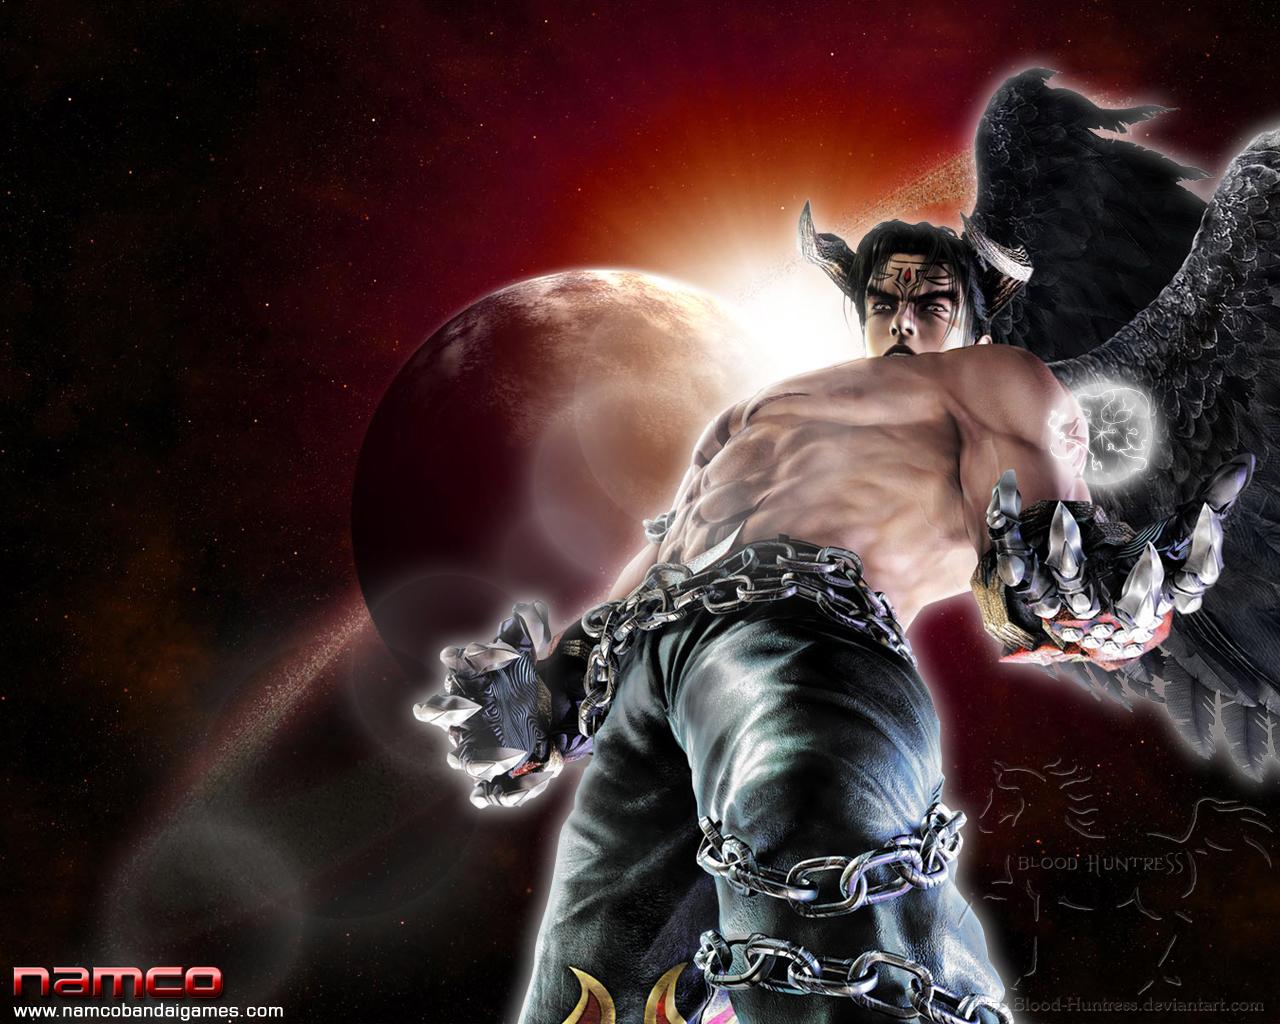 Devil Jin In Tekken 5 Dr By Blood Huntress On Deviantart